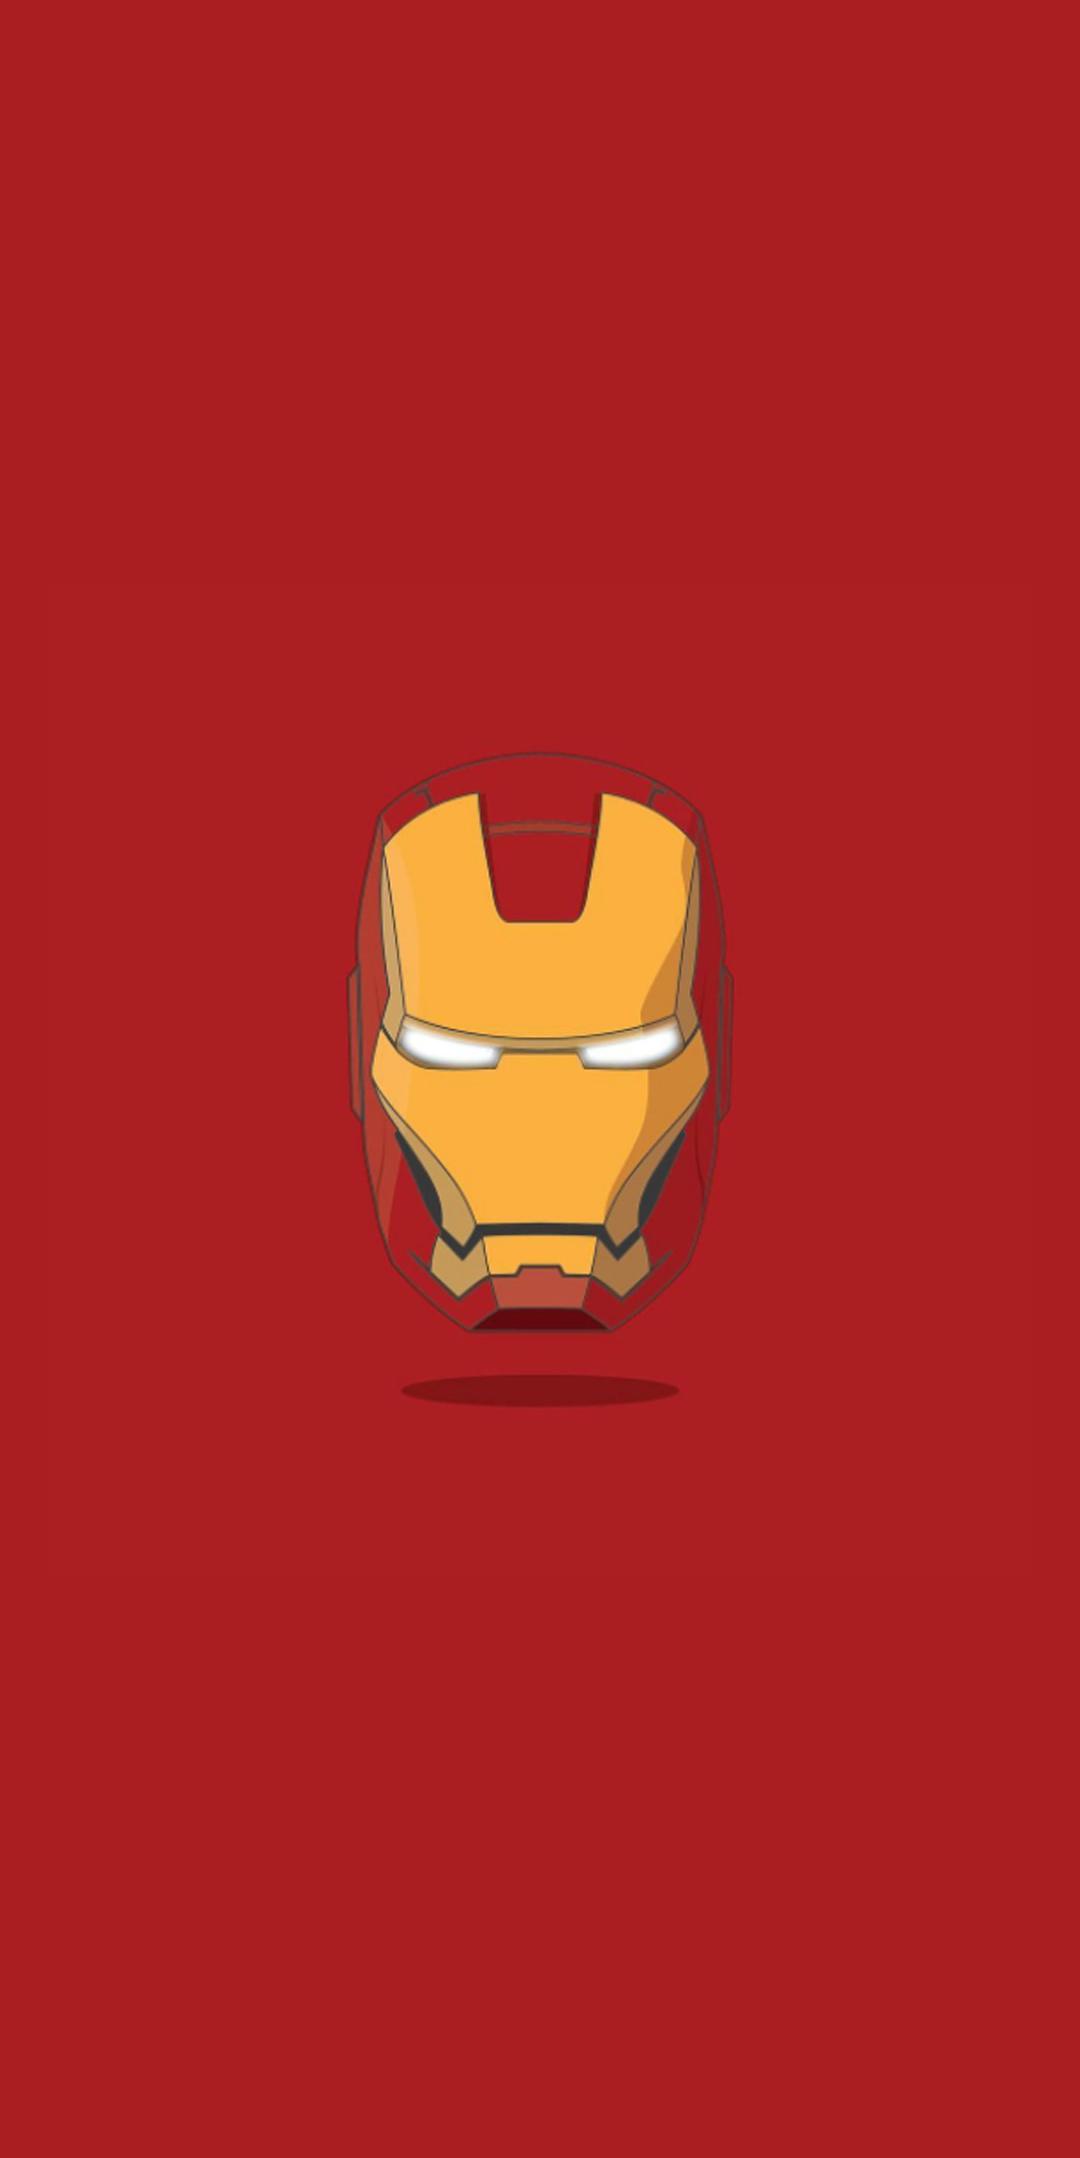 Animal Face Wallpaper Iron Man Face Armour Iphone Wallpaper Iphone Wallpapers